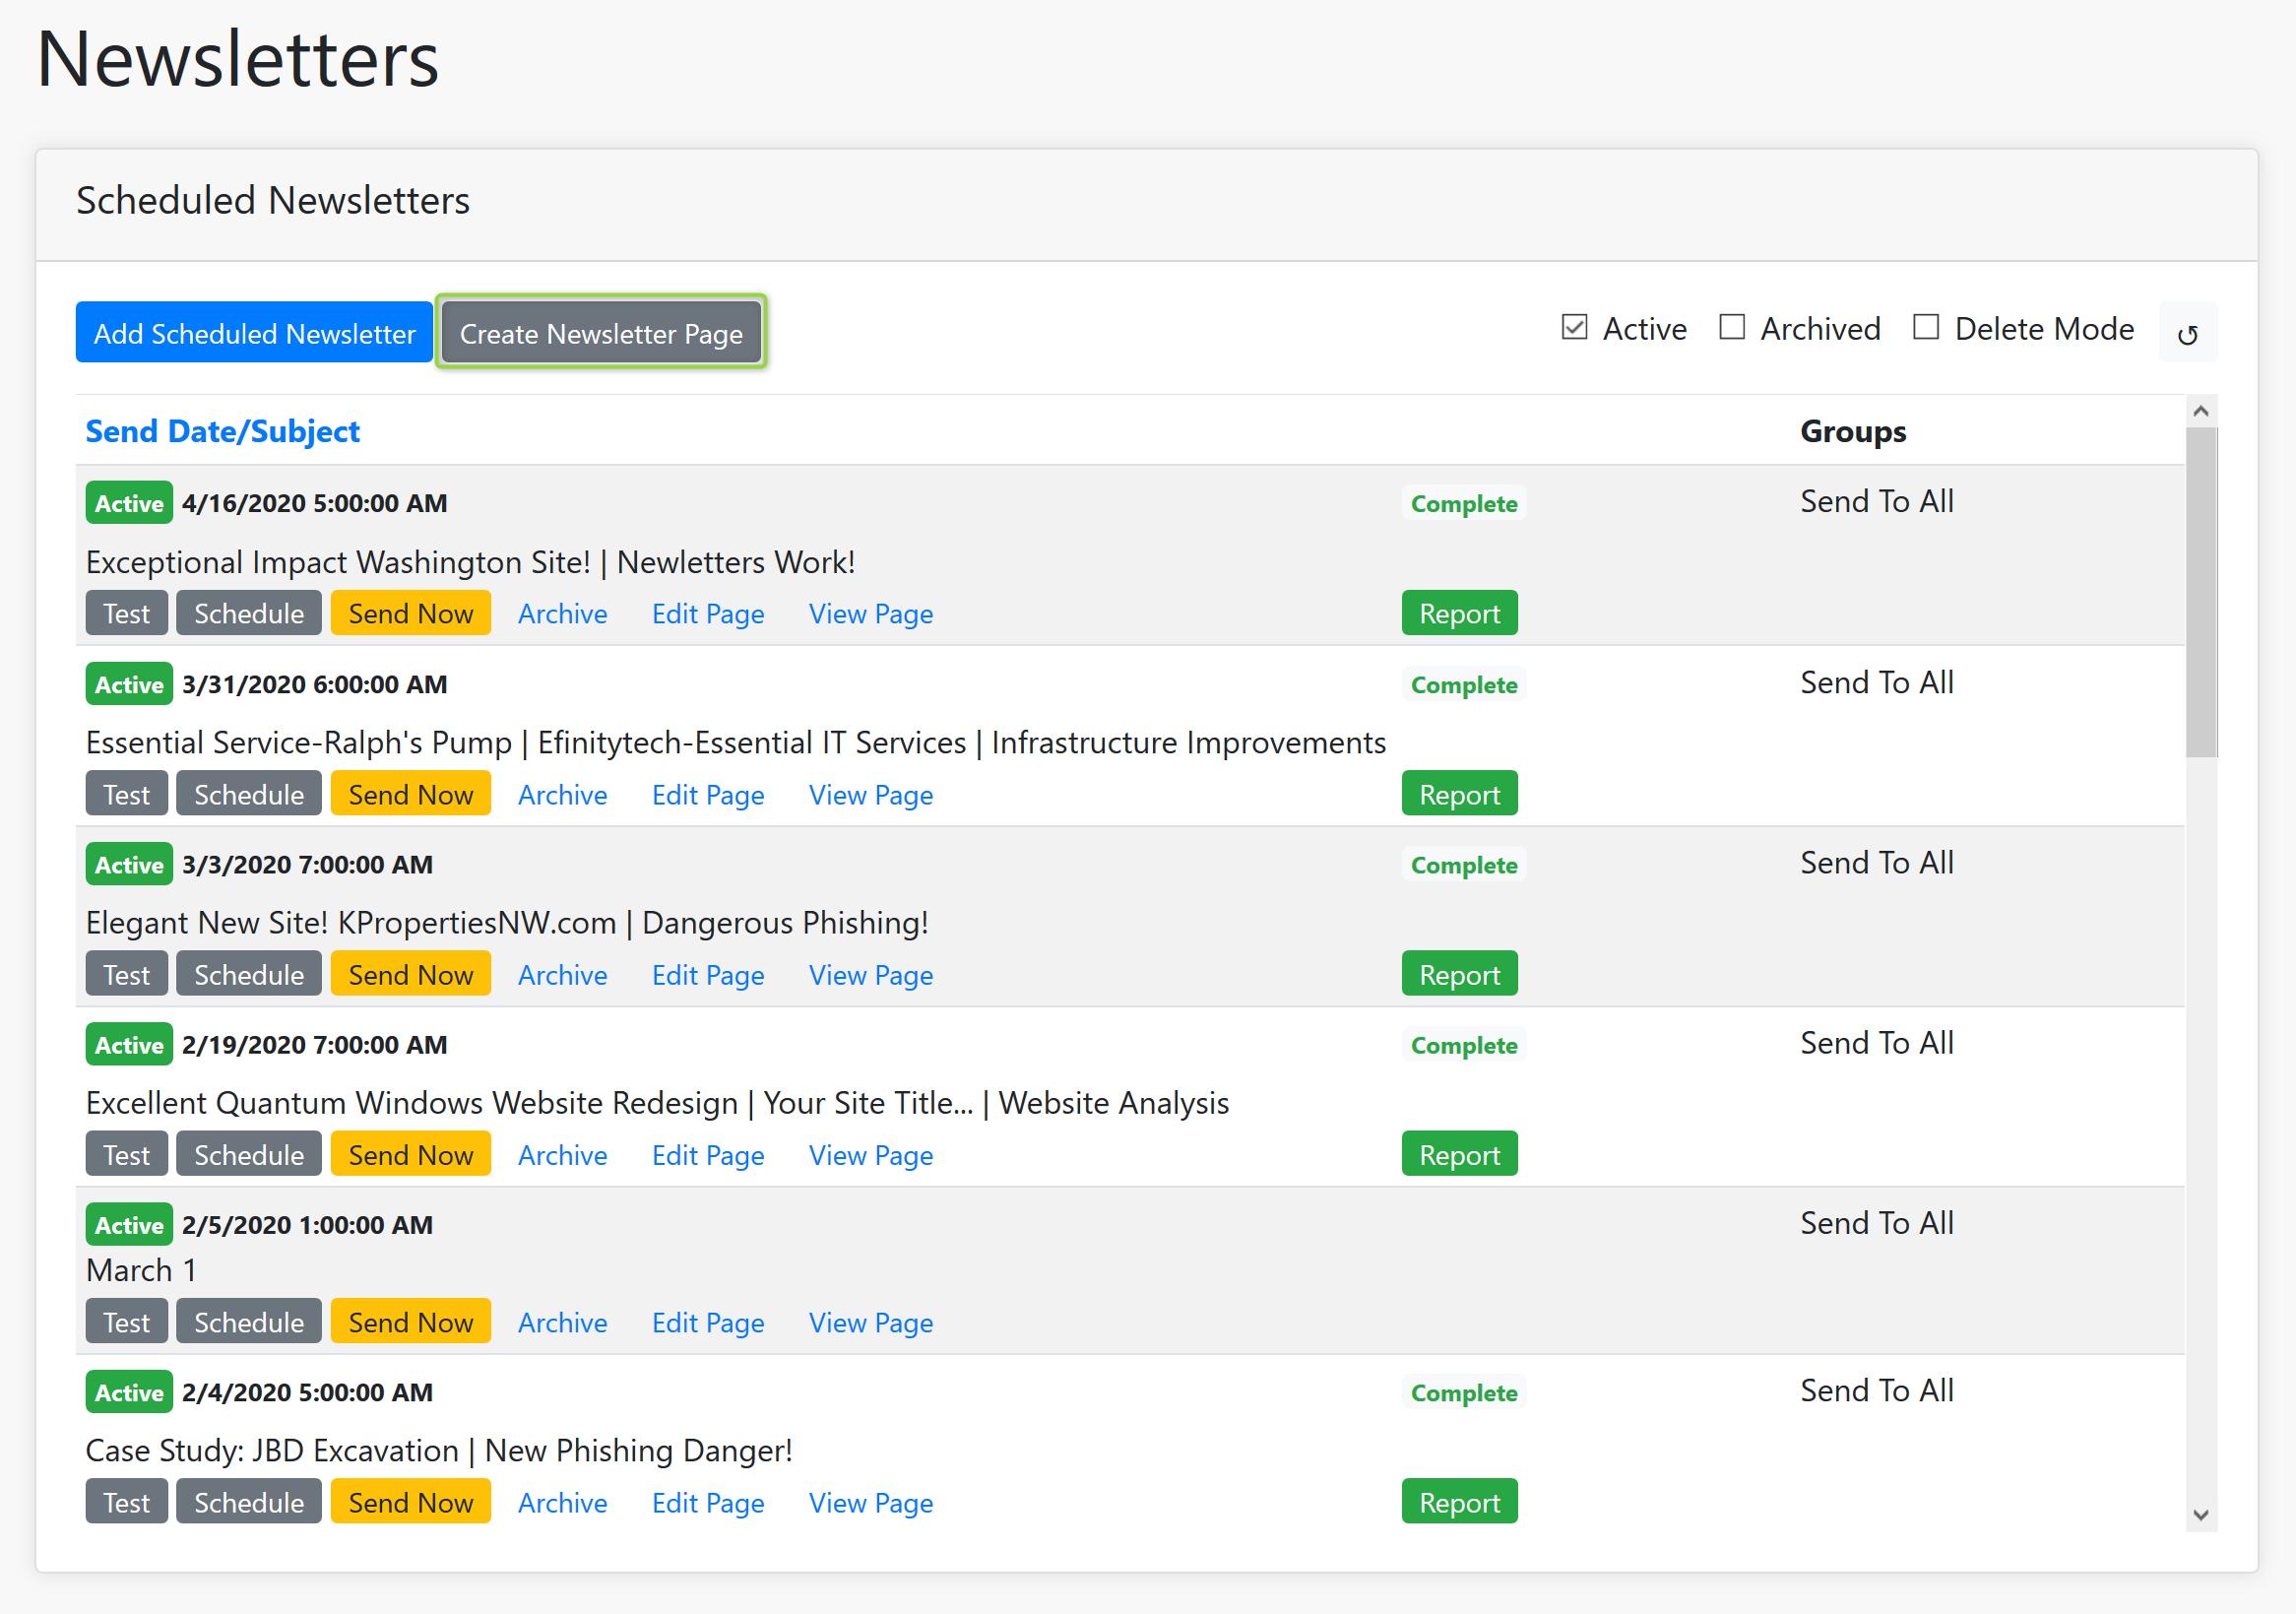 Create Newsletter Page Screenshot